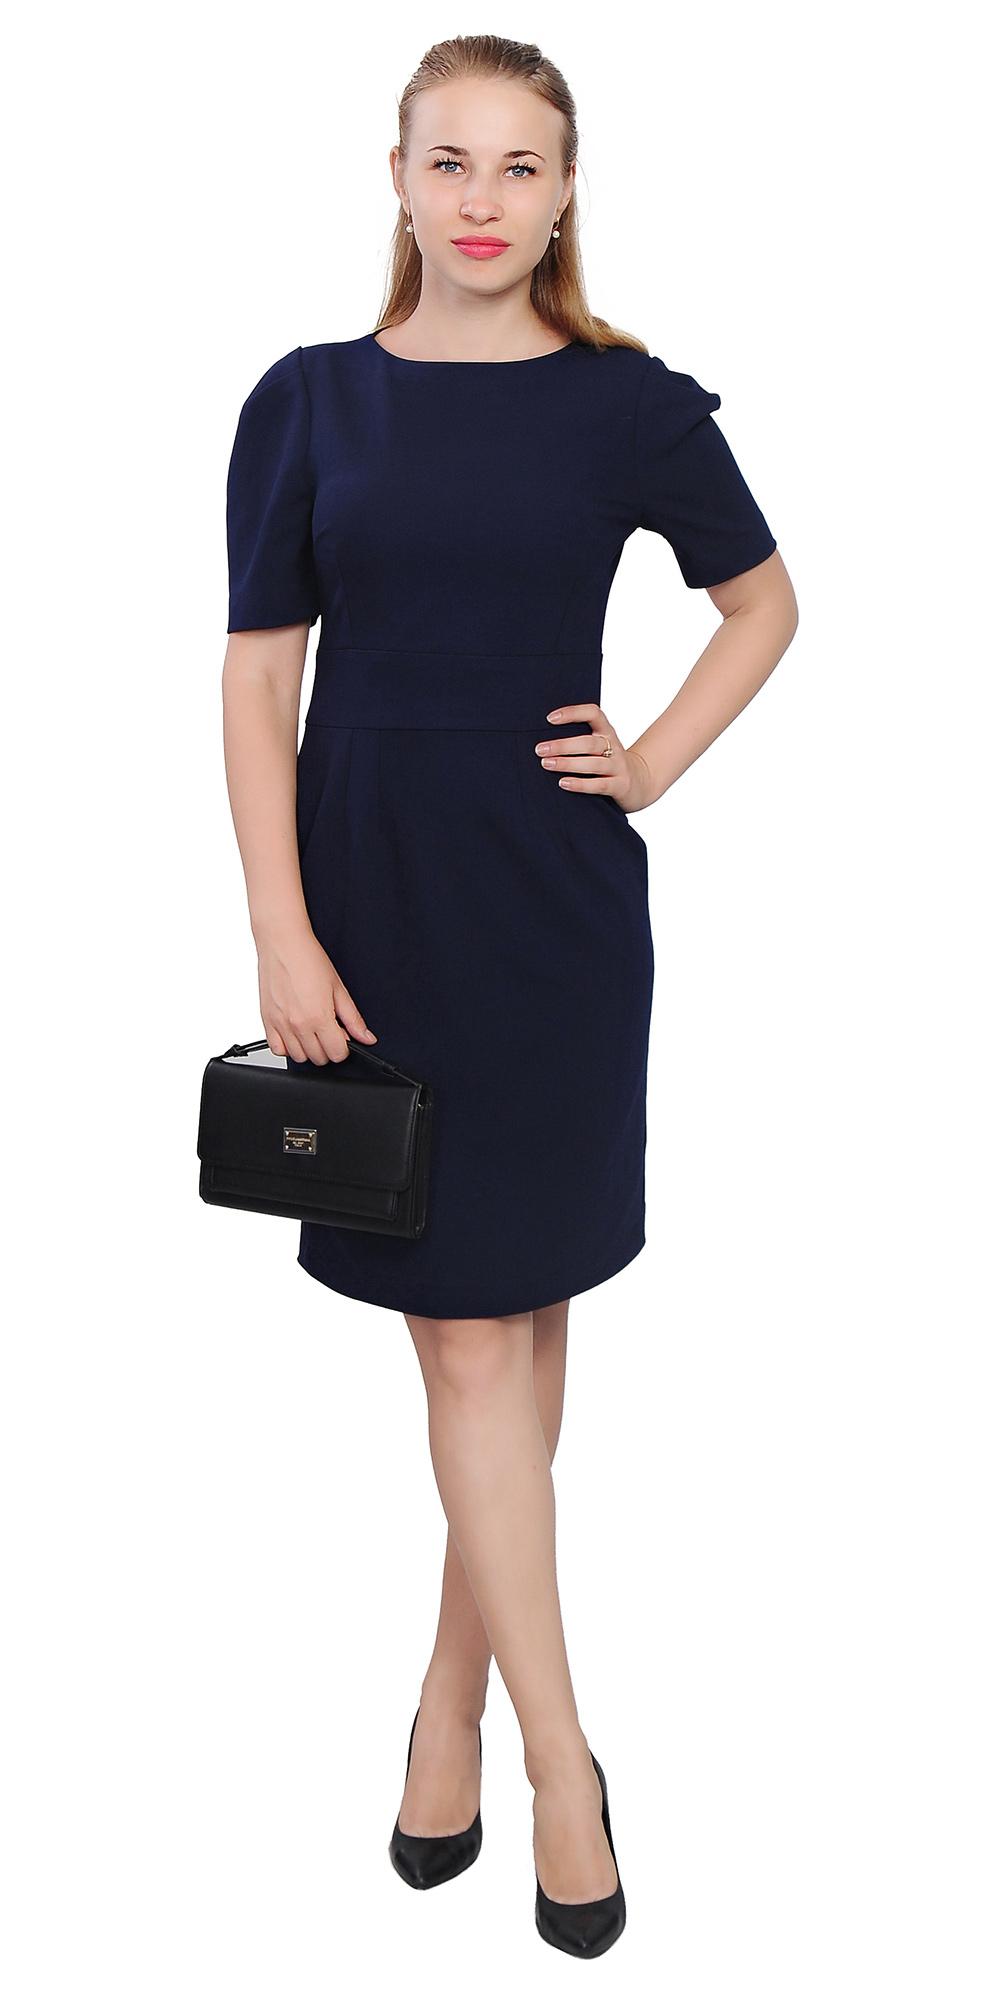 Black dress office - Women 039 S Elegant Office Work Business Dress